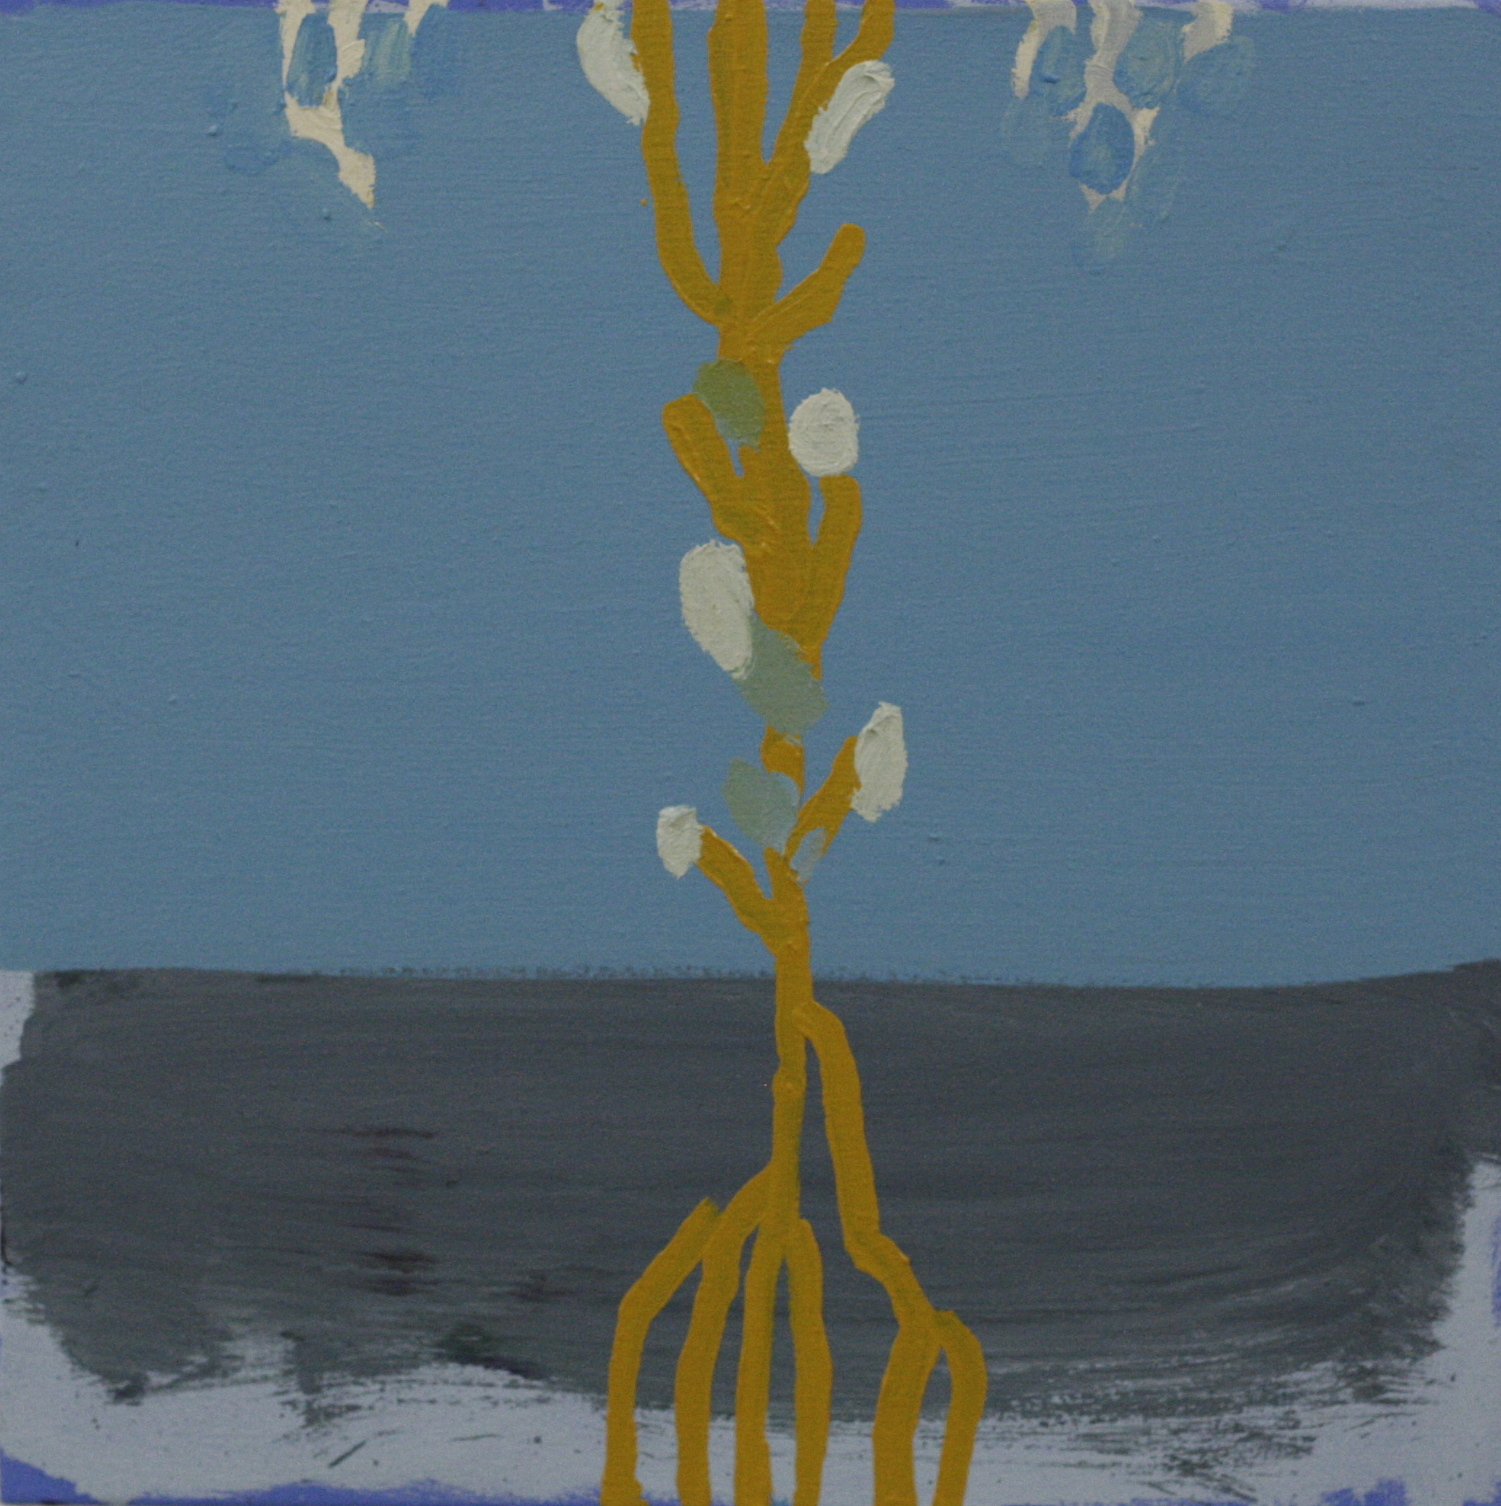 Matthew Tome_Blossom_oil on canvas_56x56cm.JPG